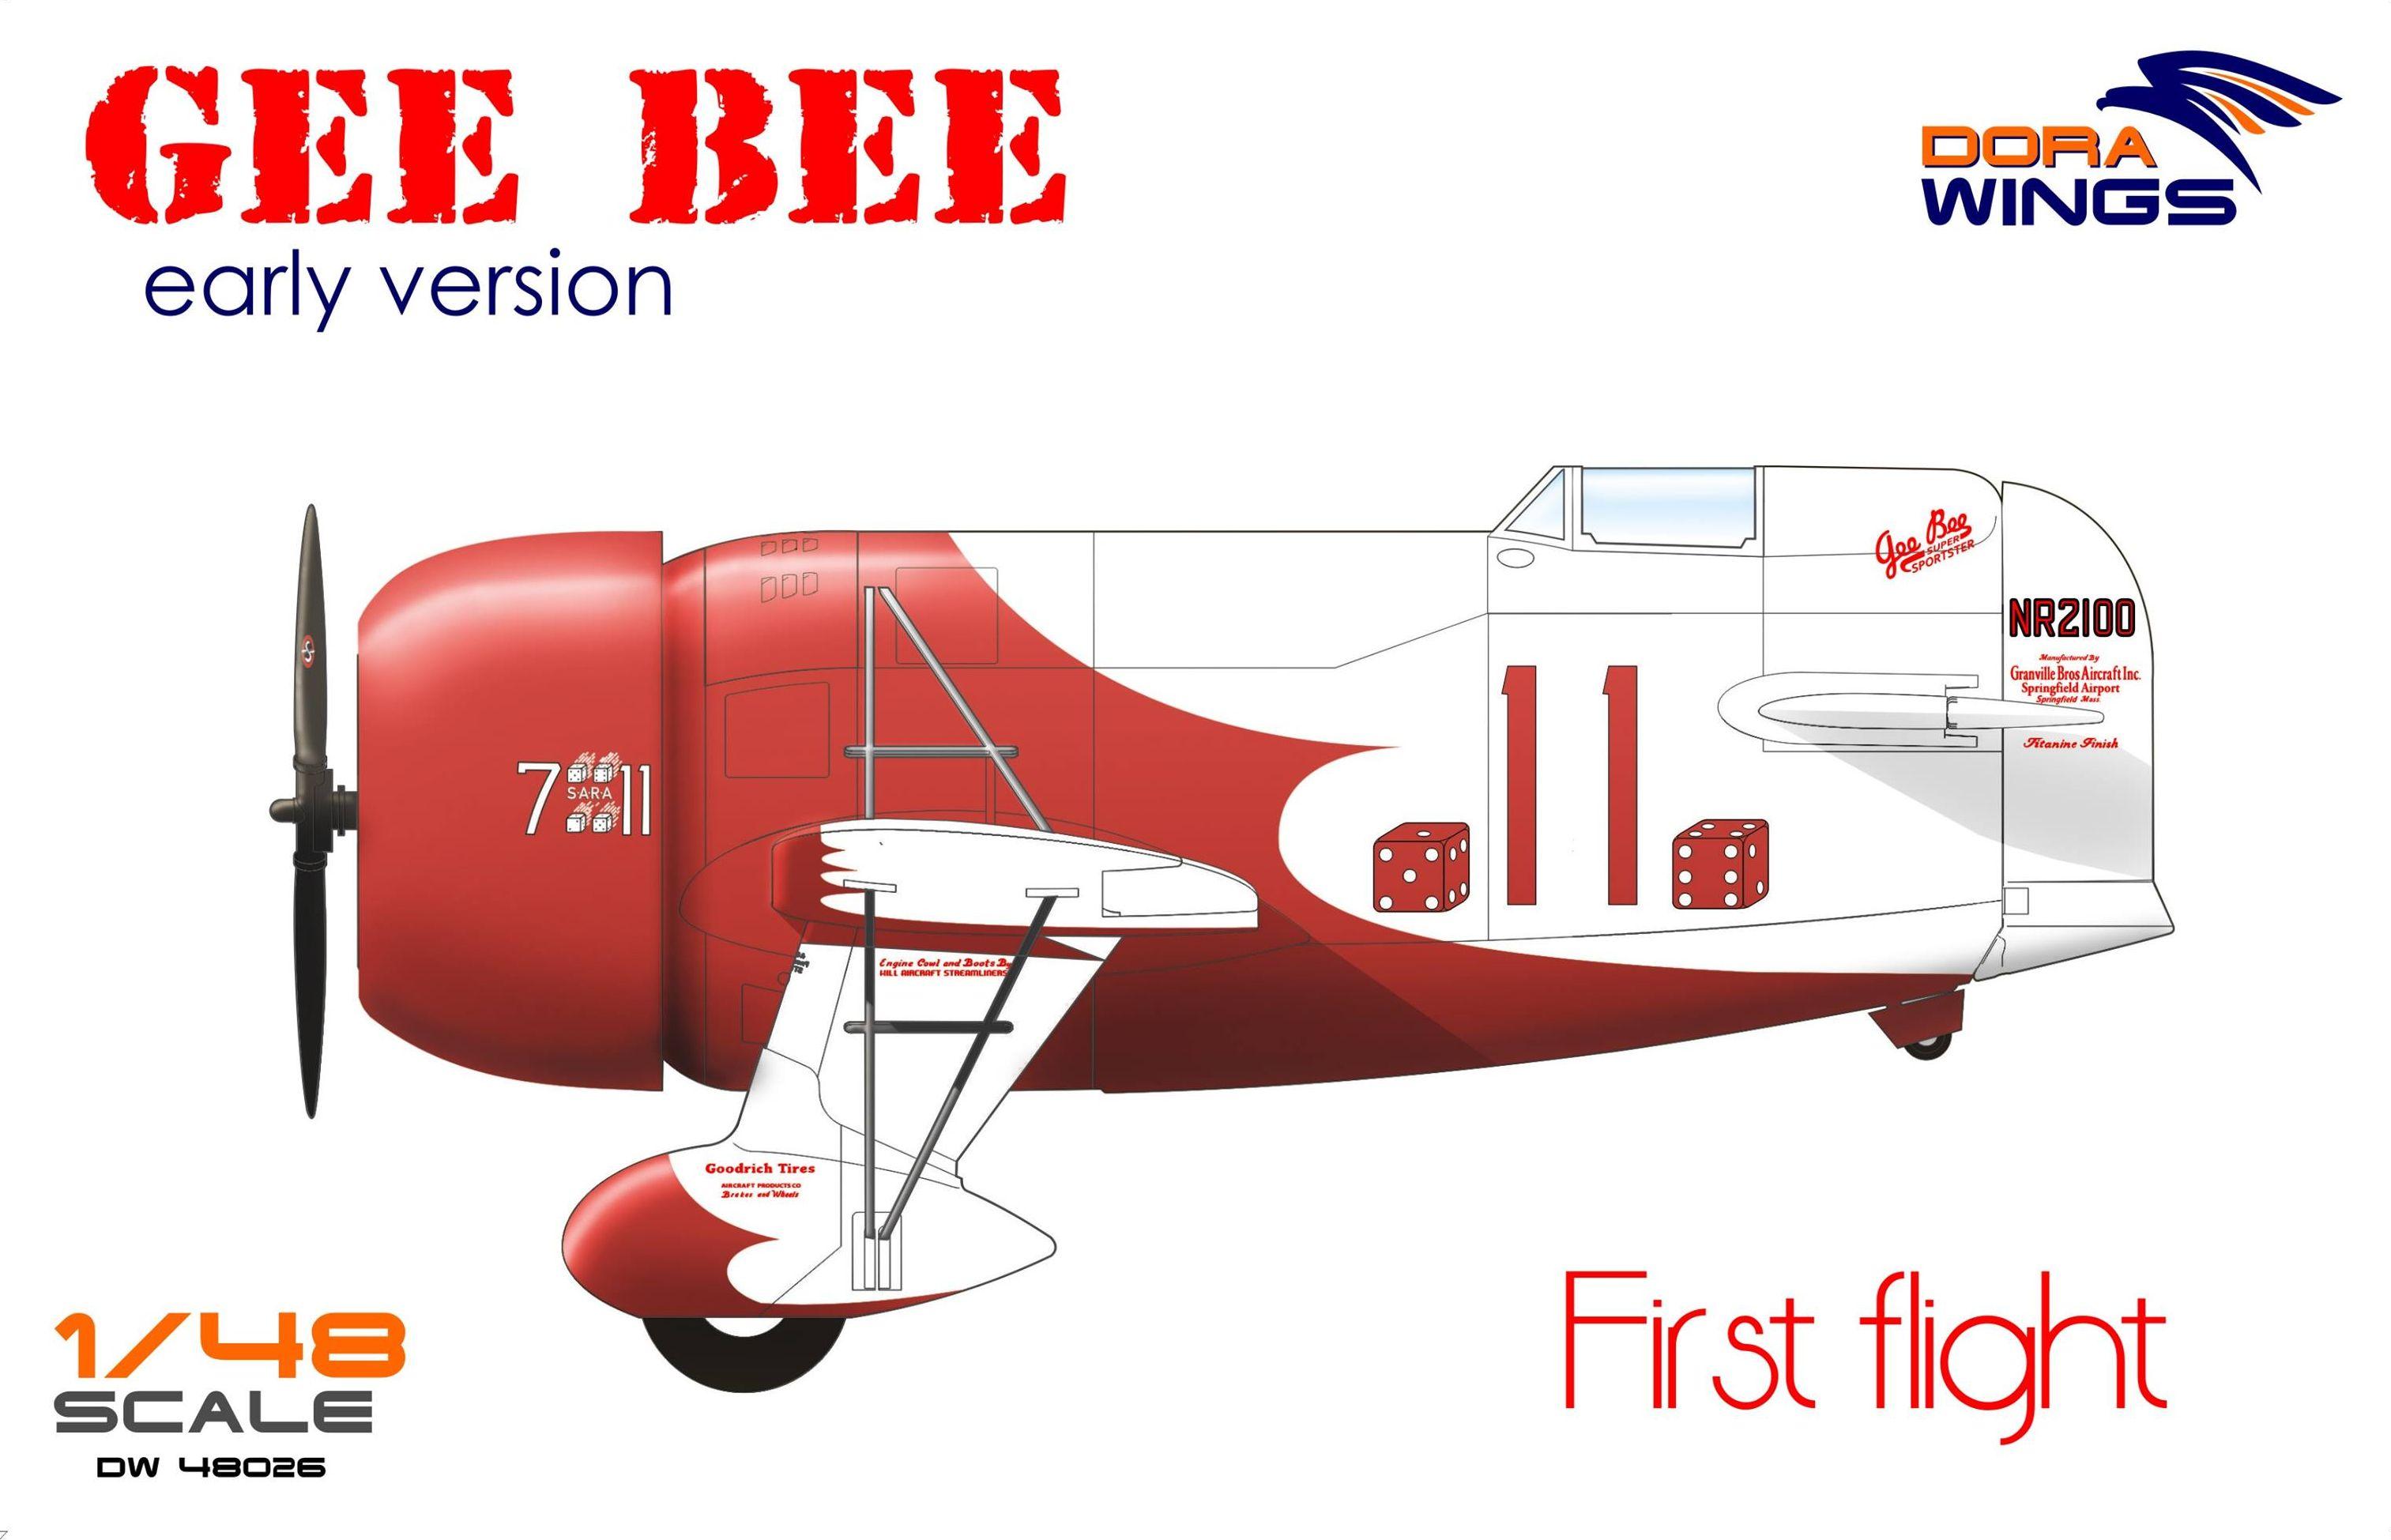 Dora Wings Gee Bee Super Sportster R-1 (early version)